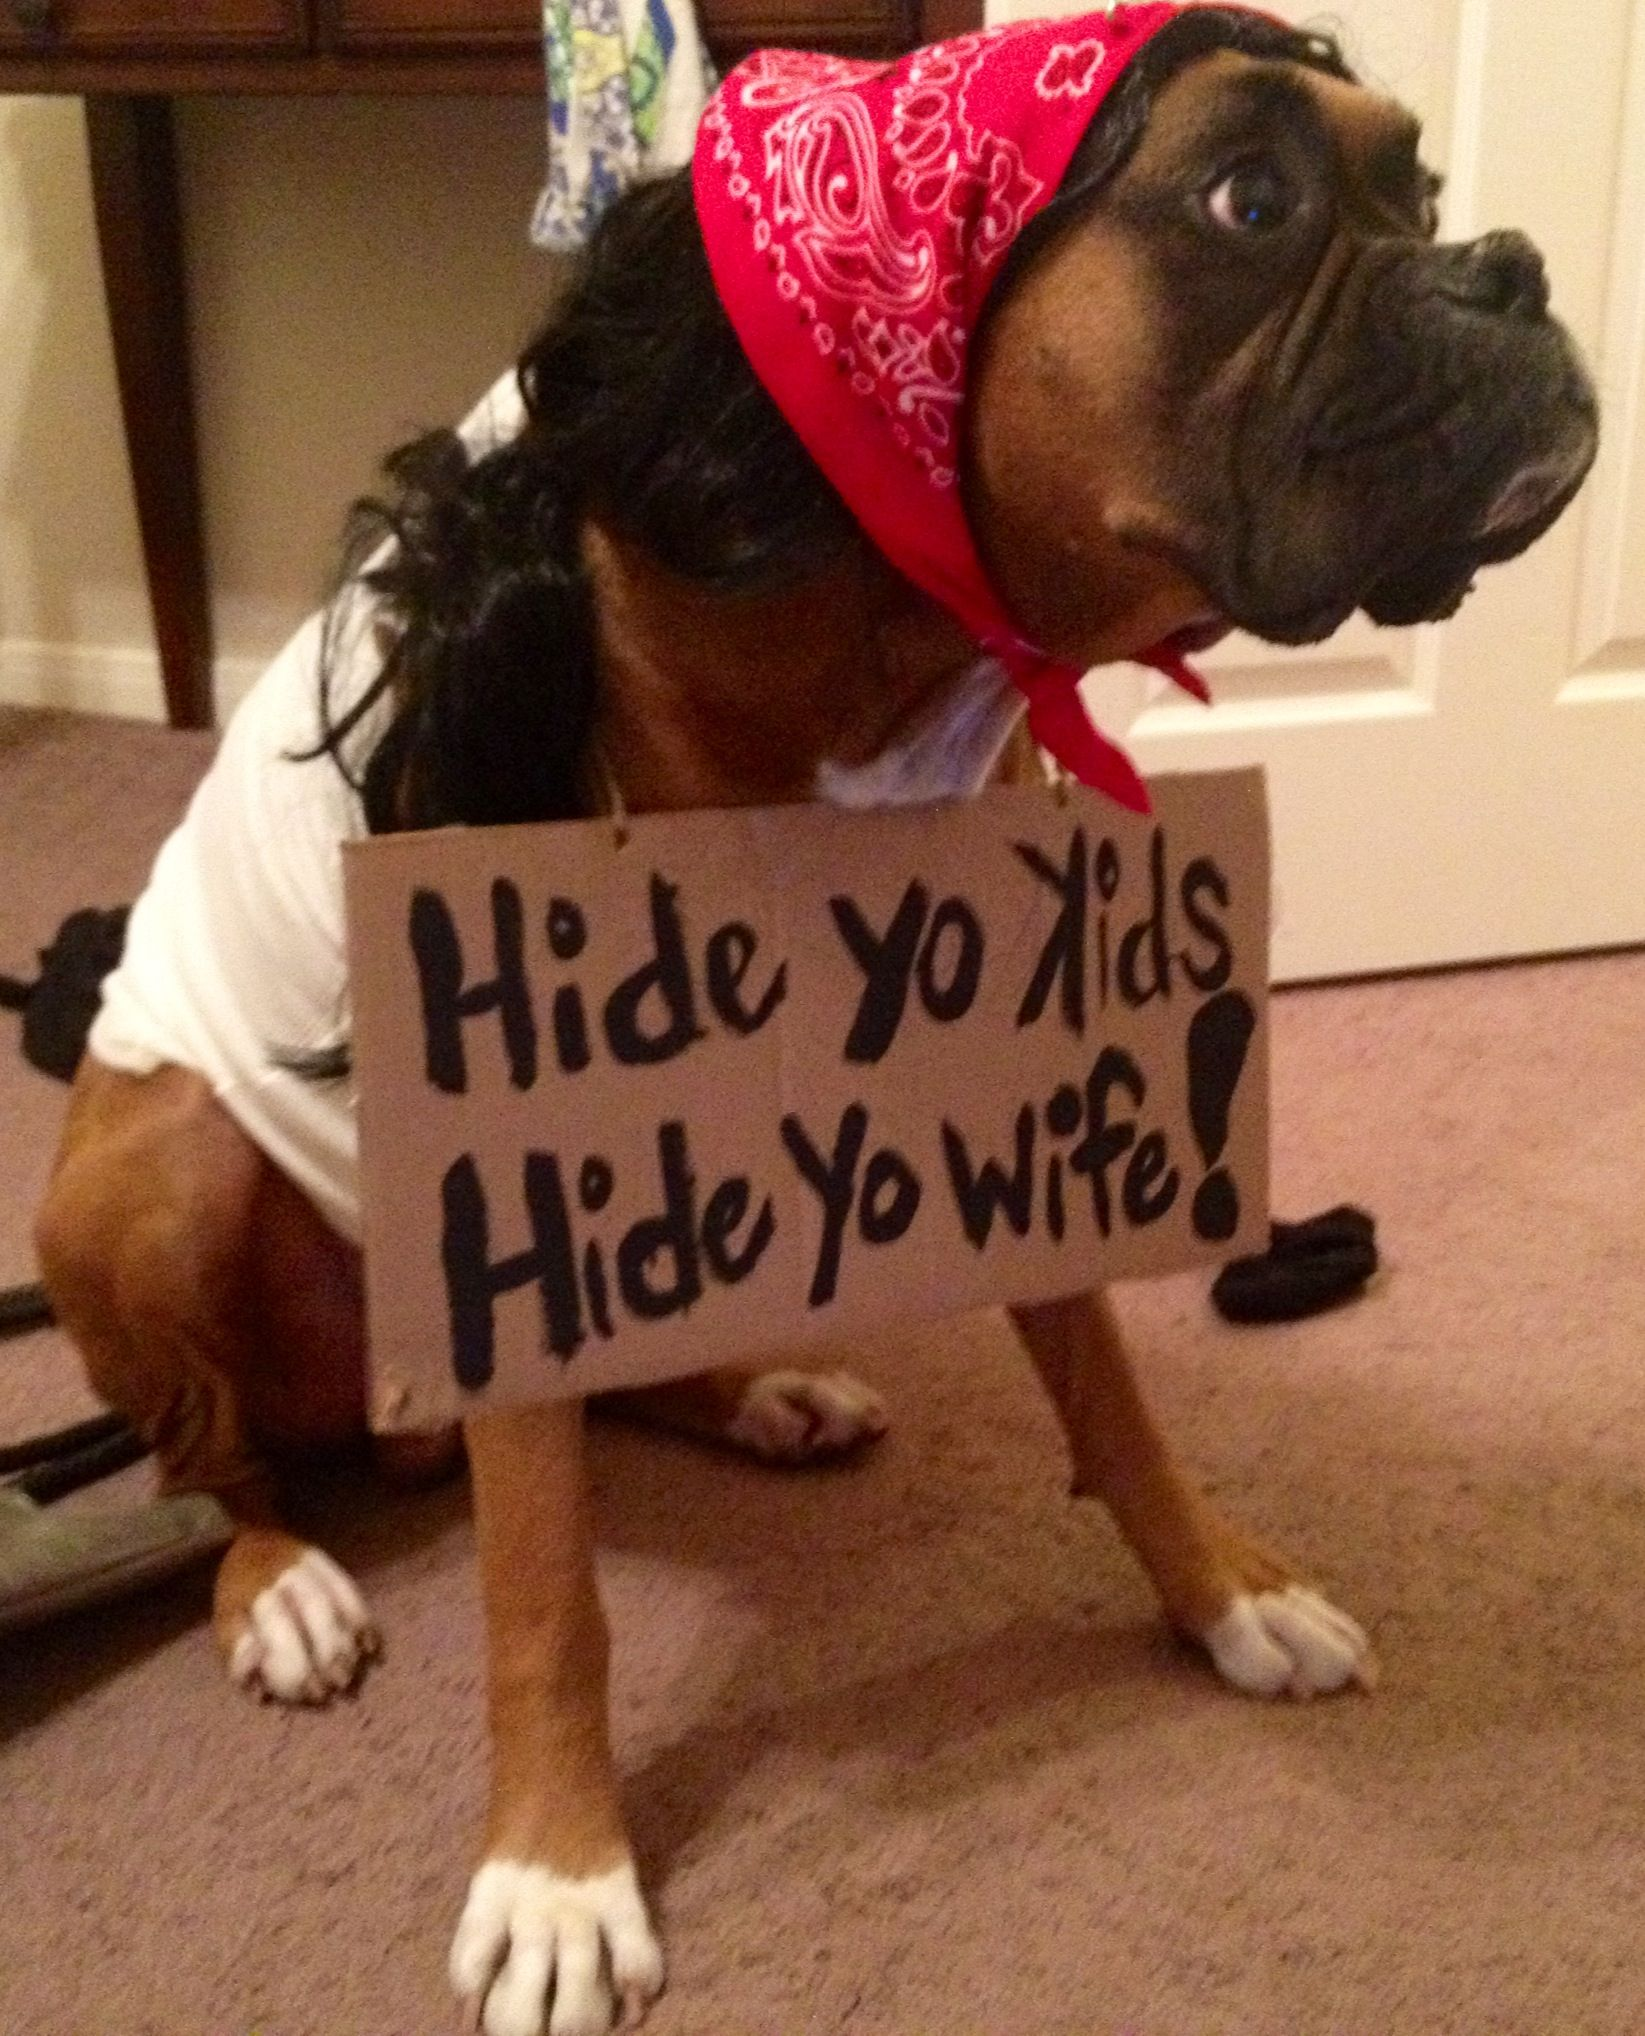 boxer halloween costume the infamous antoine dogson easiest diy costume ever hide yo kids hide yo wife - How To Make A Dog Halloween Costume